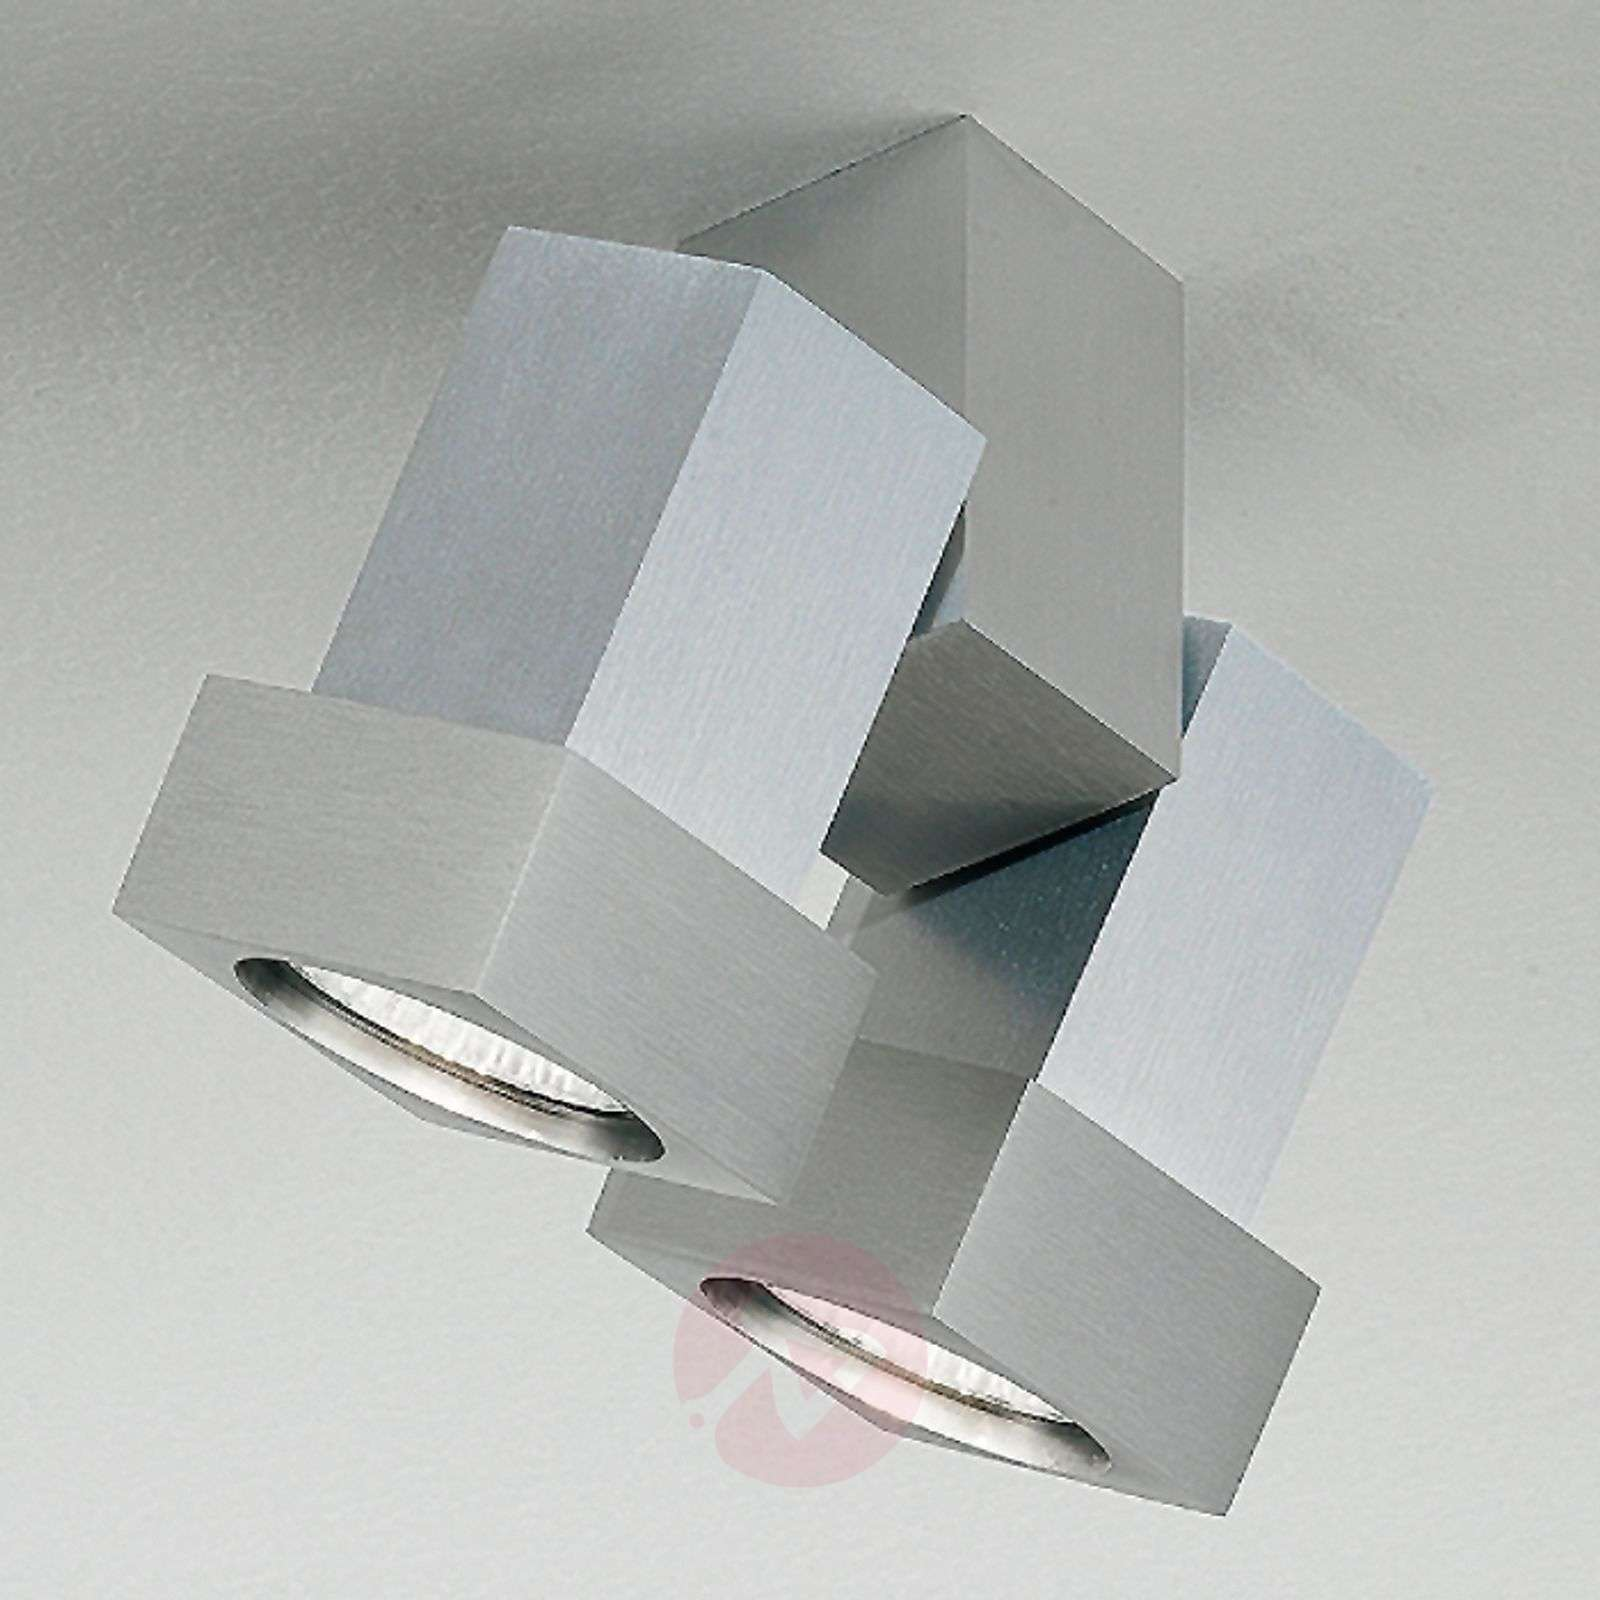 Sierstrip Chroom Badkamer : Style q ceiling or wall spotlight two bulb lights.ie